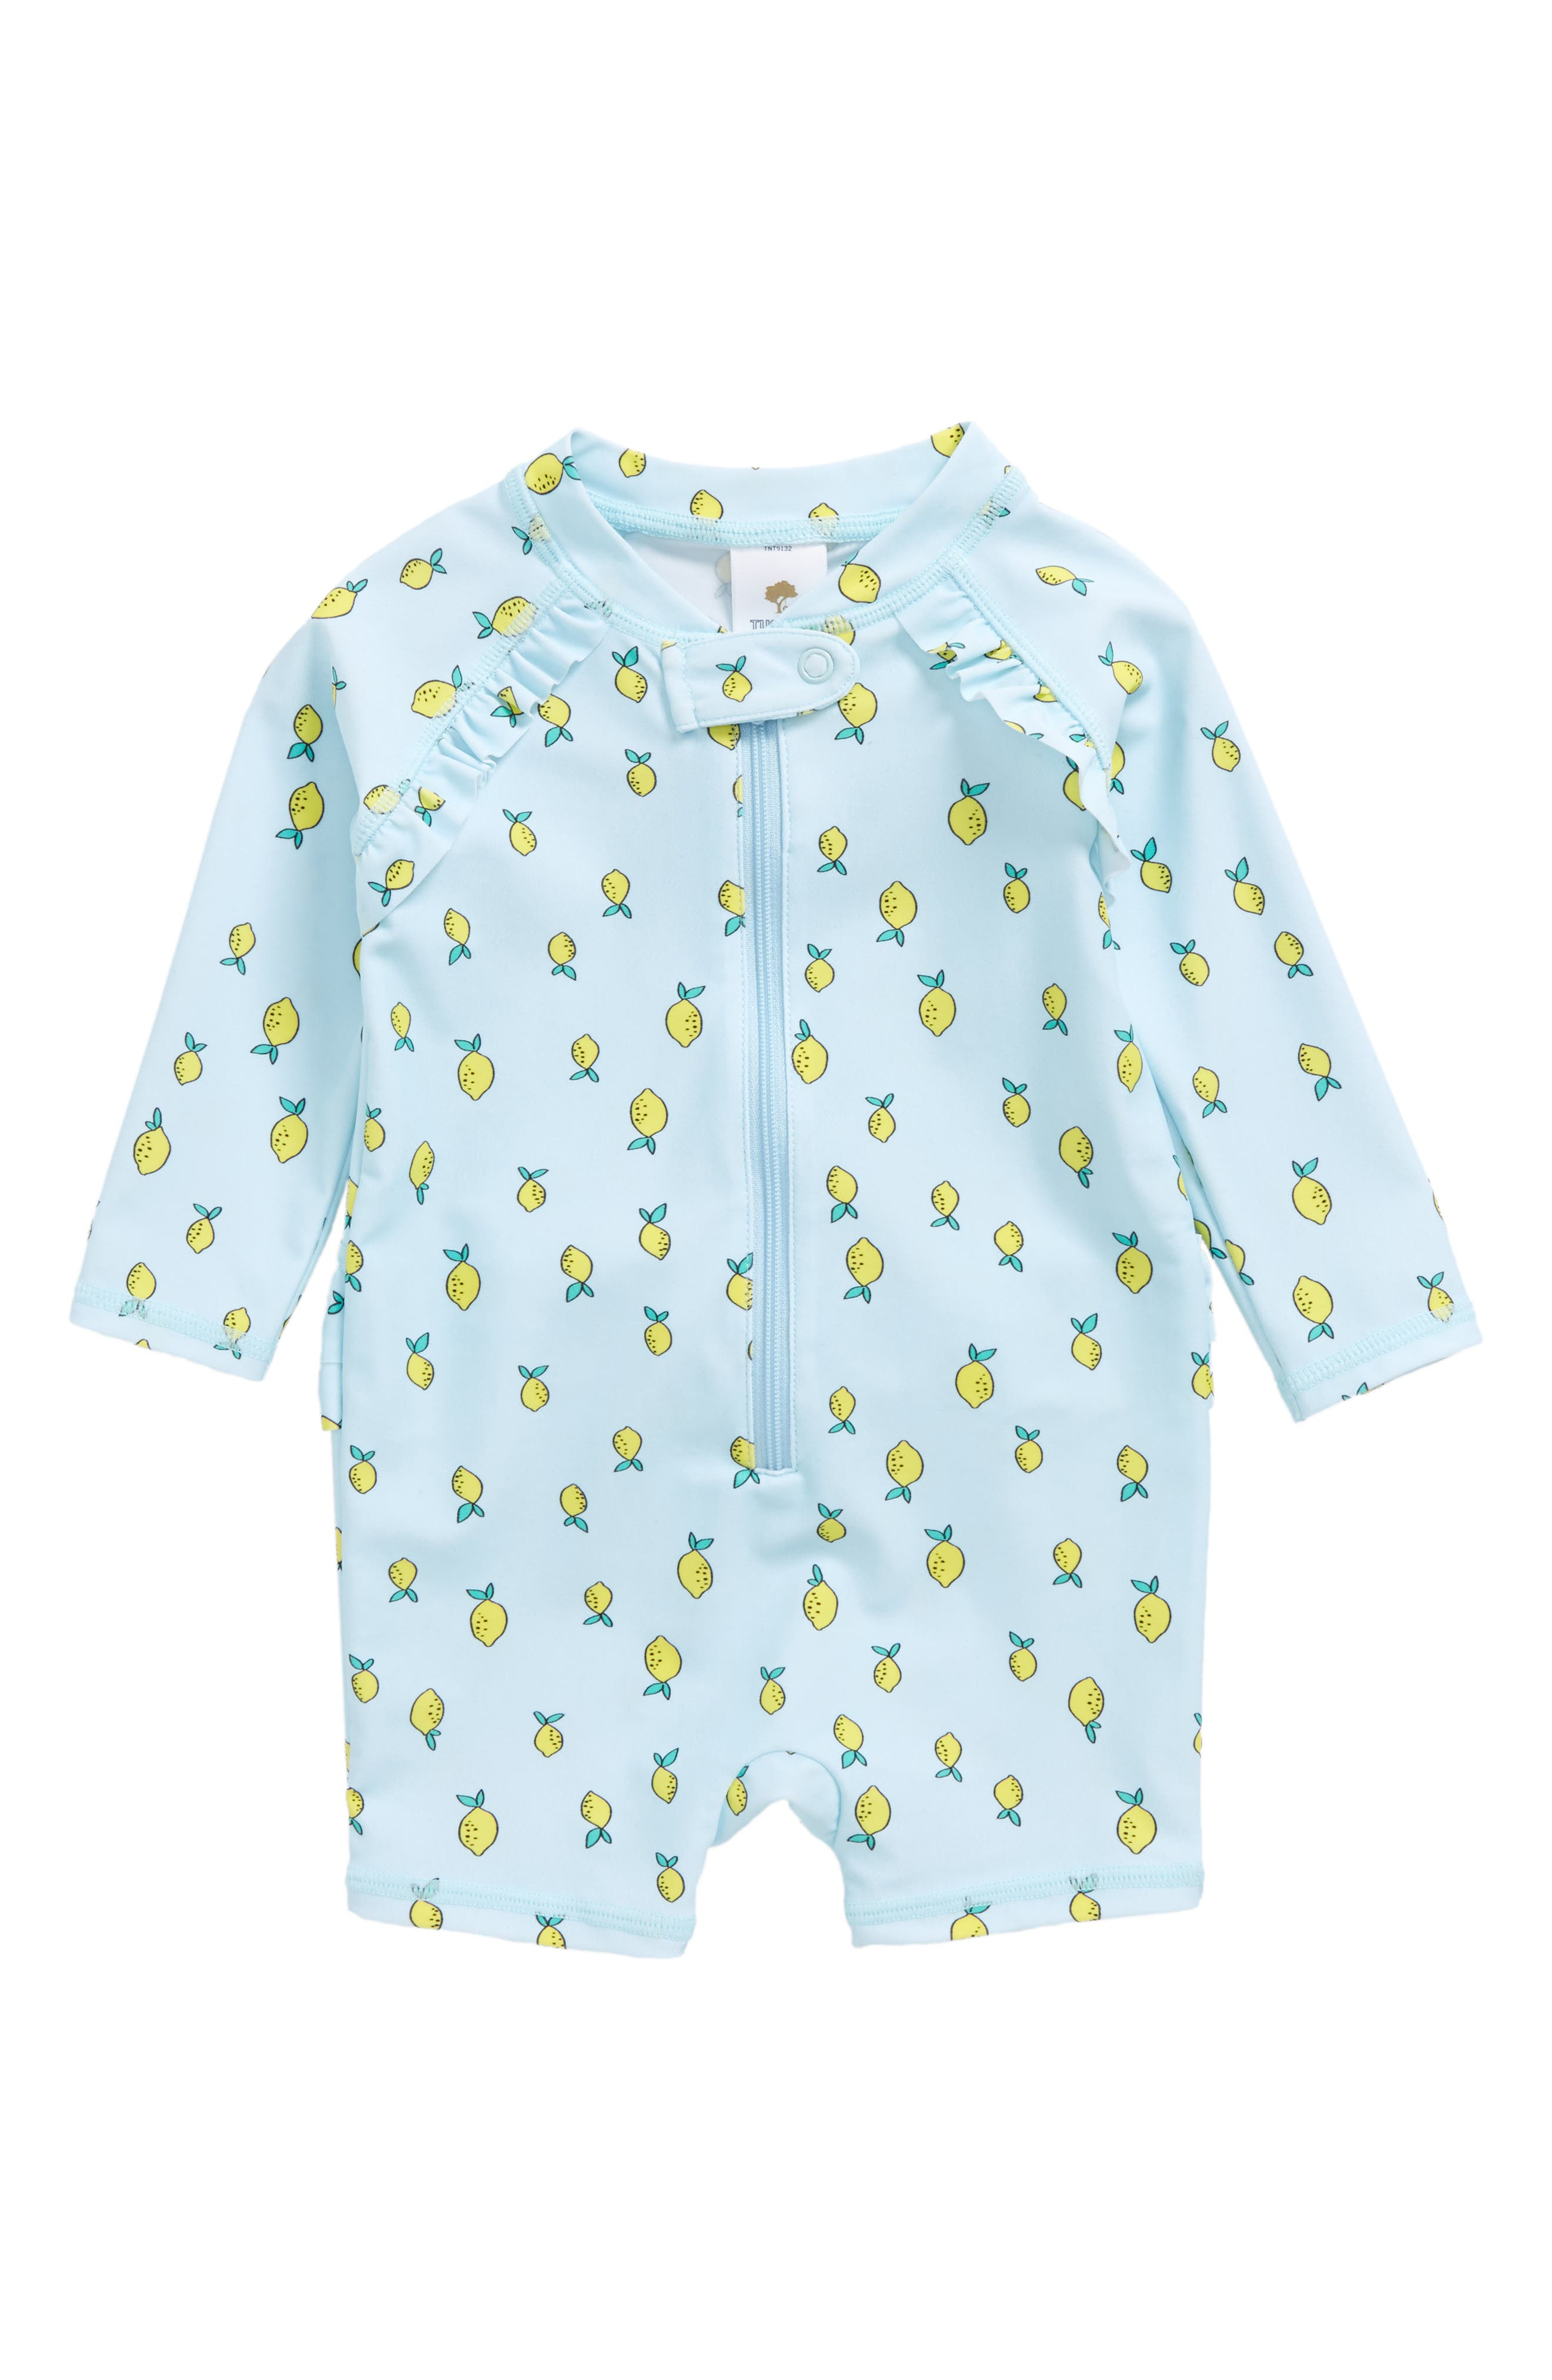 Alternate Image 1 Selected - Tucker + Tate Lemon Print One-Piece Rashguard Swimsuit (Baby Girls)